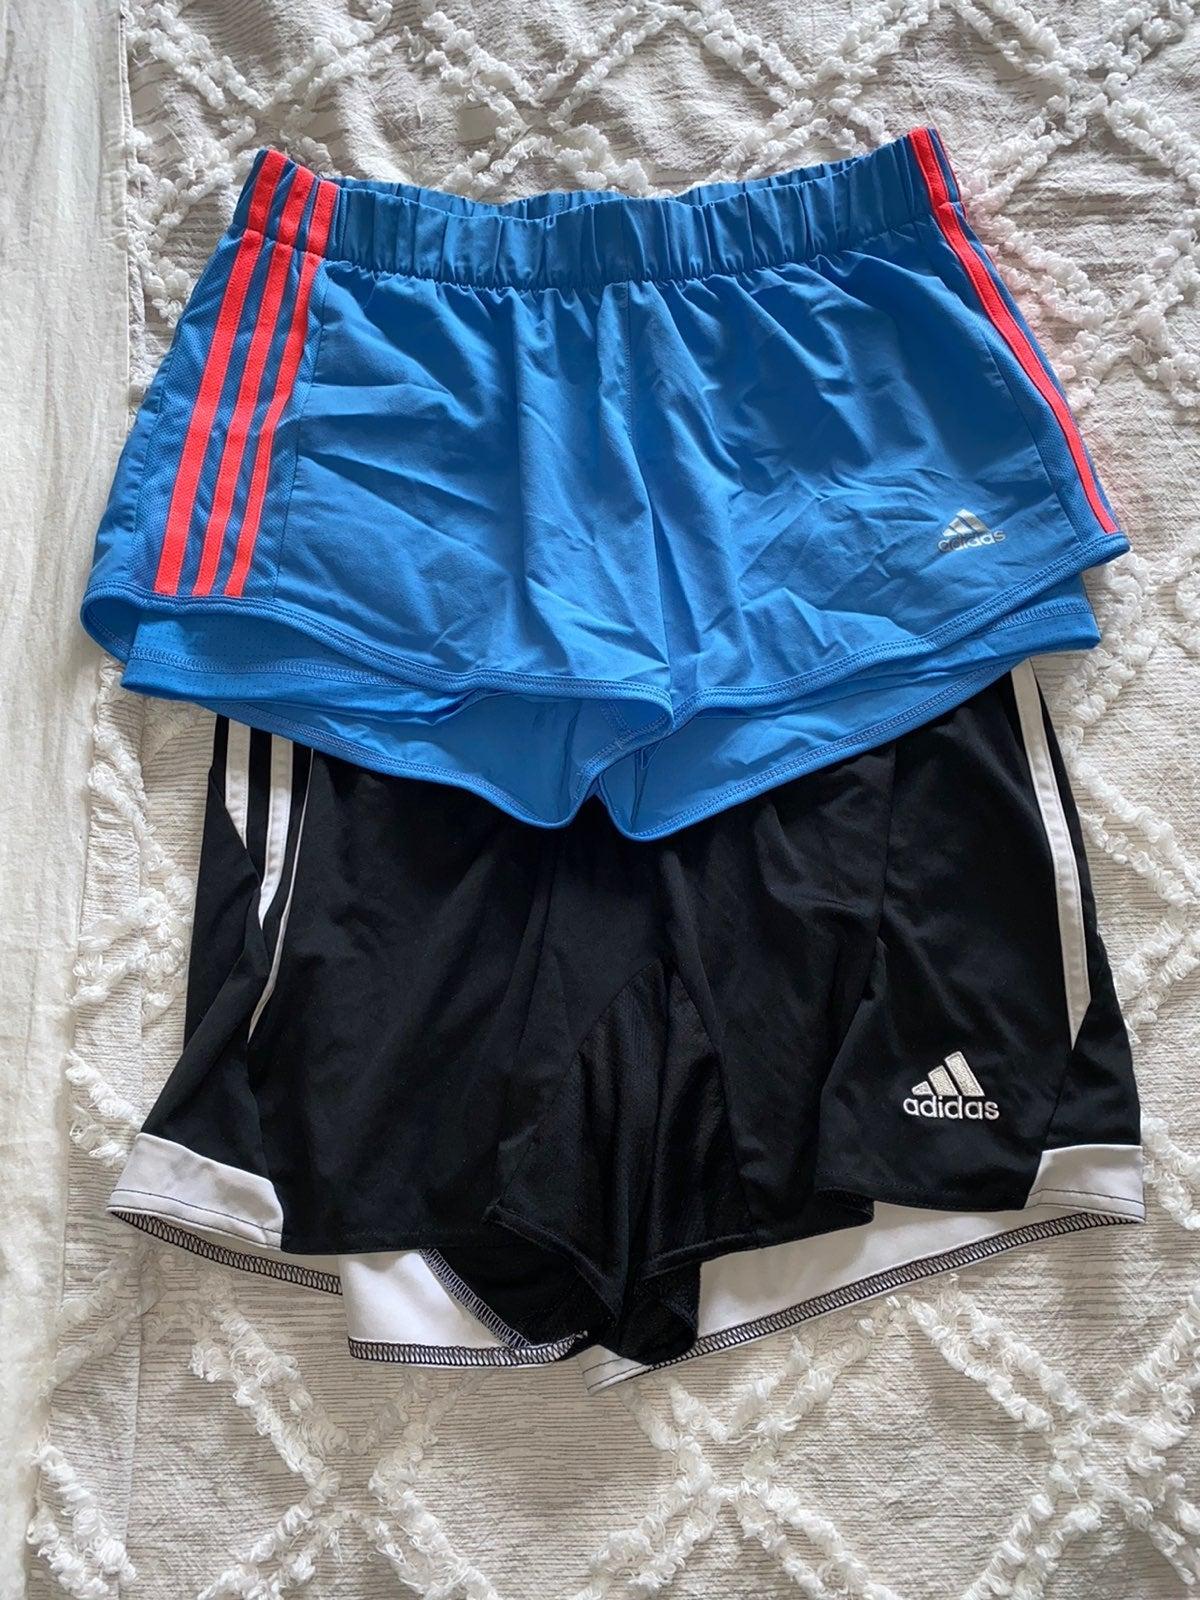 Adidas Running Shorts 2 pairs